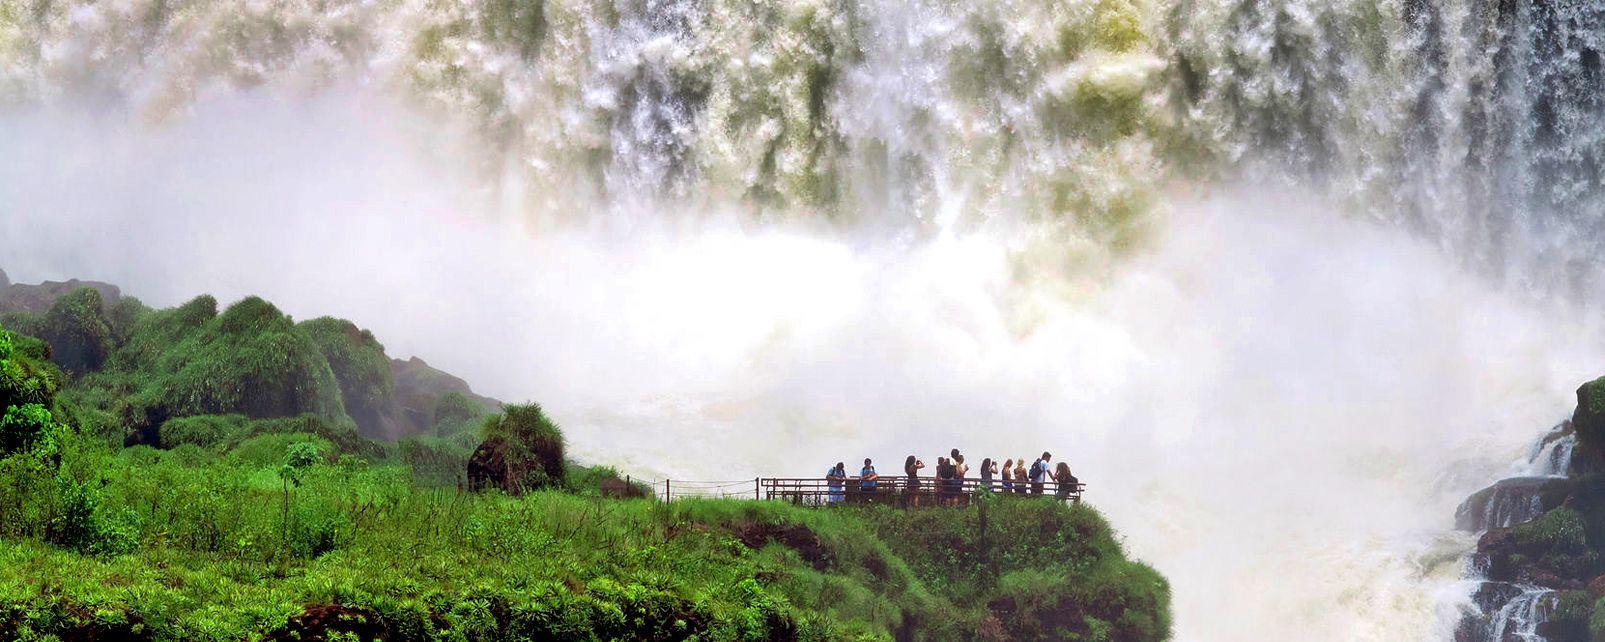 Las cataratas de Iguazú , Argentina